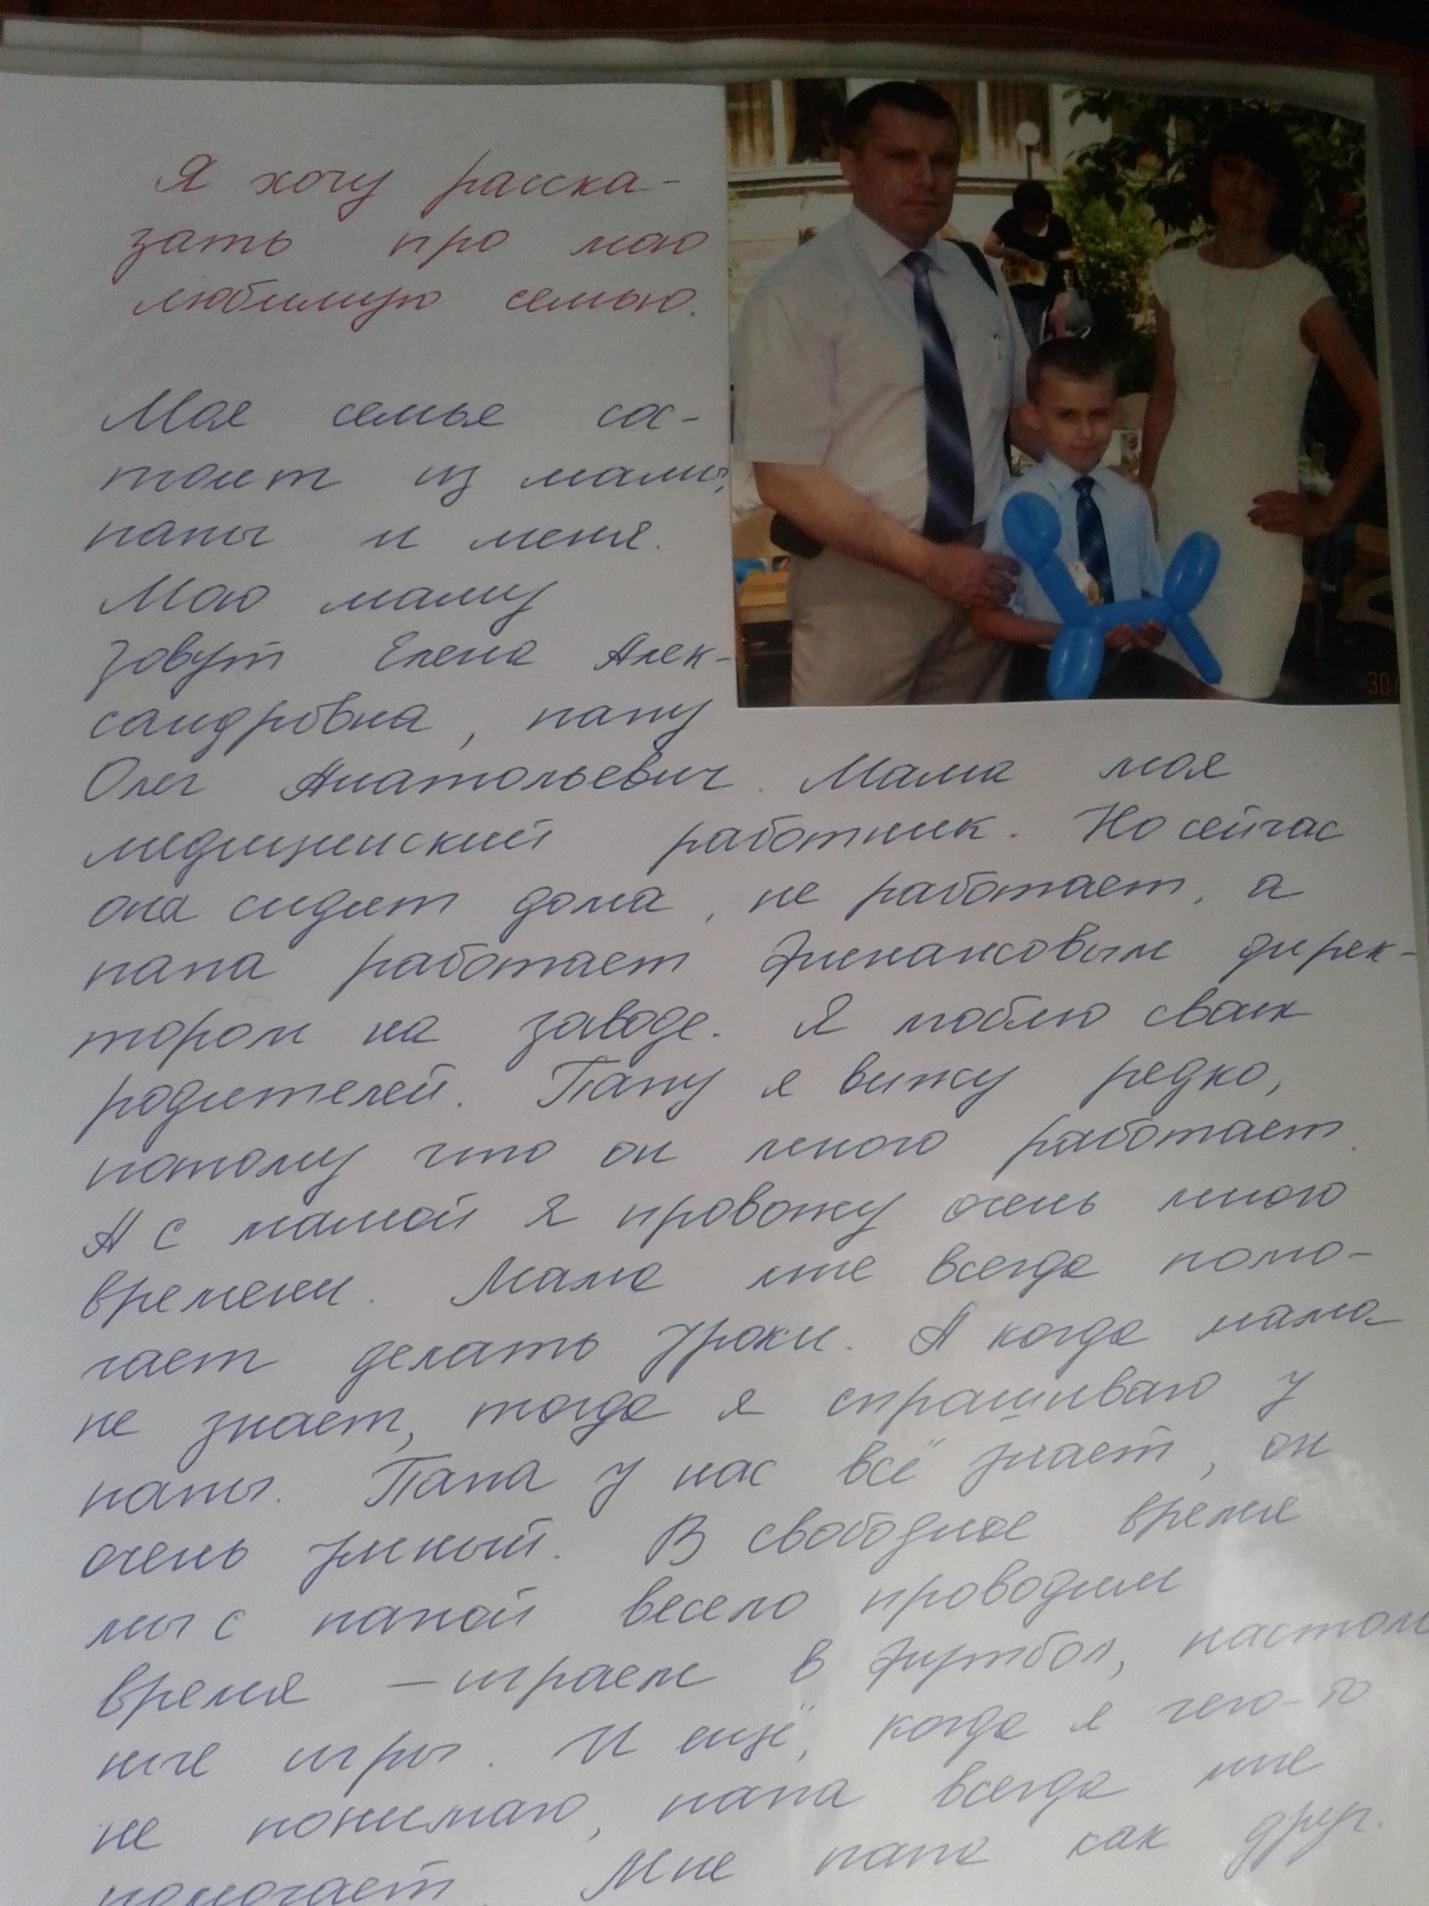 C:\Users\Vladimir\Pictures\2016-01-21 долматов портфолио\долматов портфолио 050.jpg